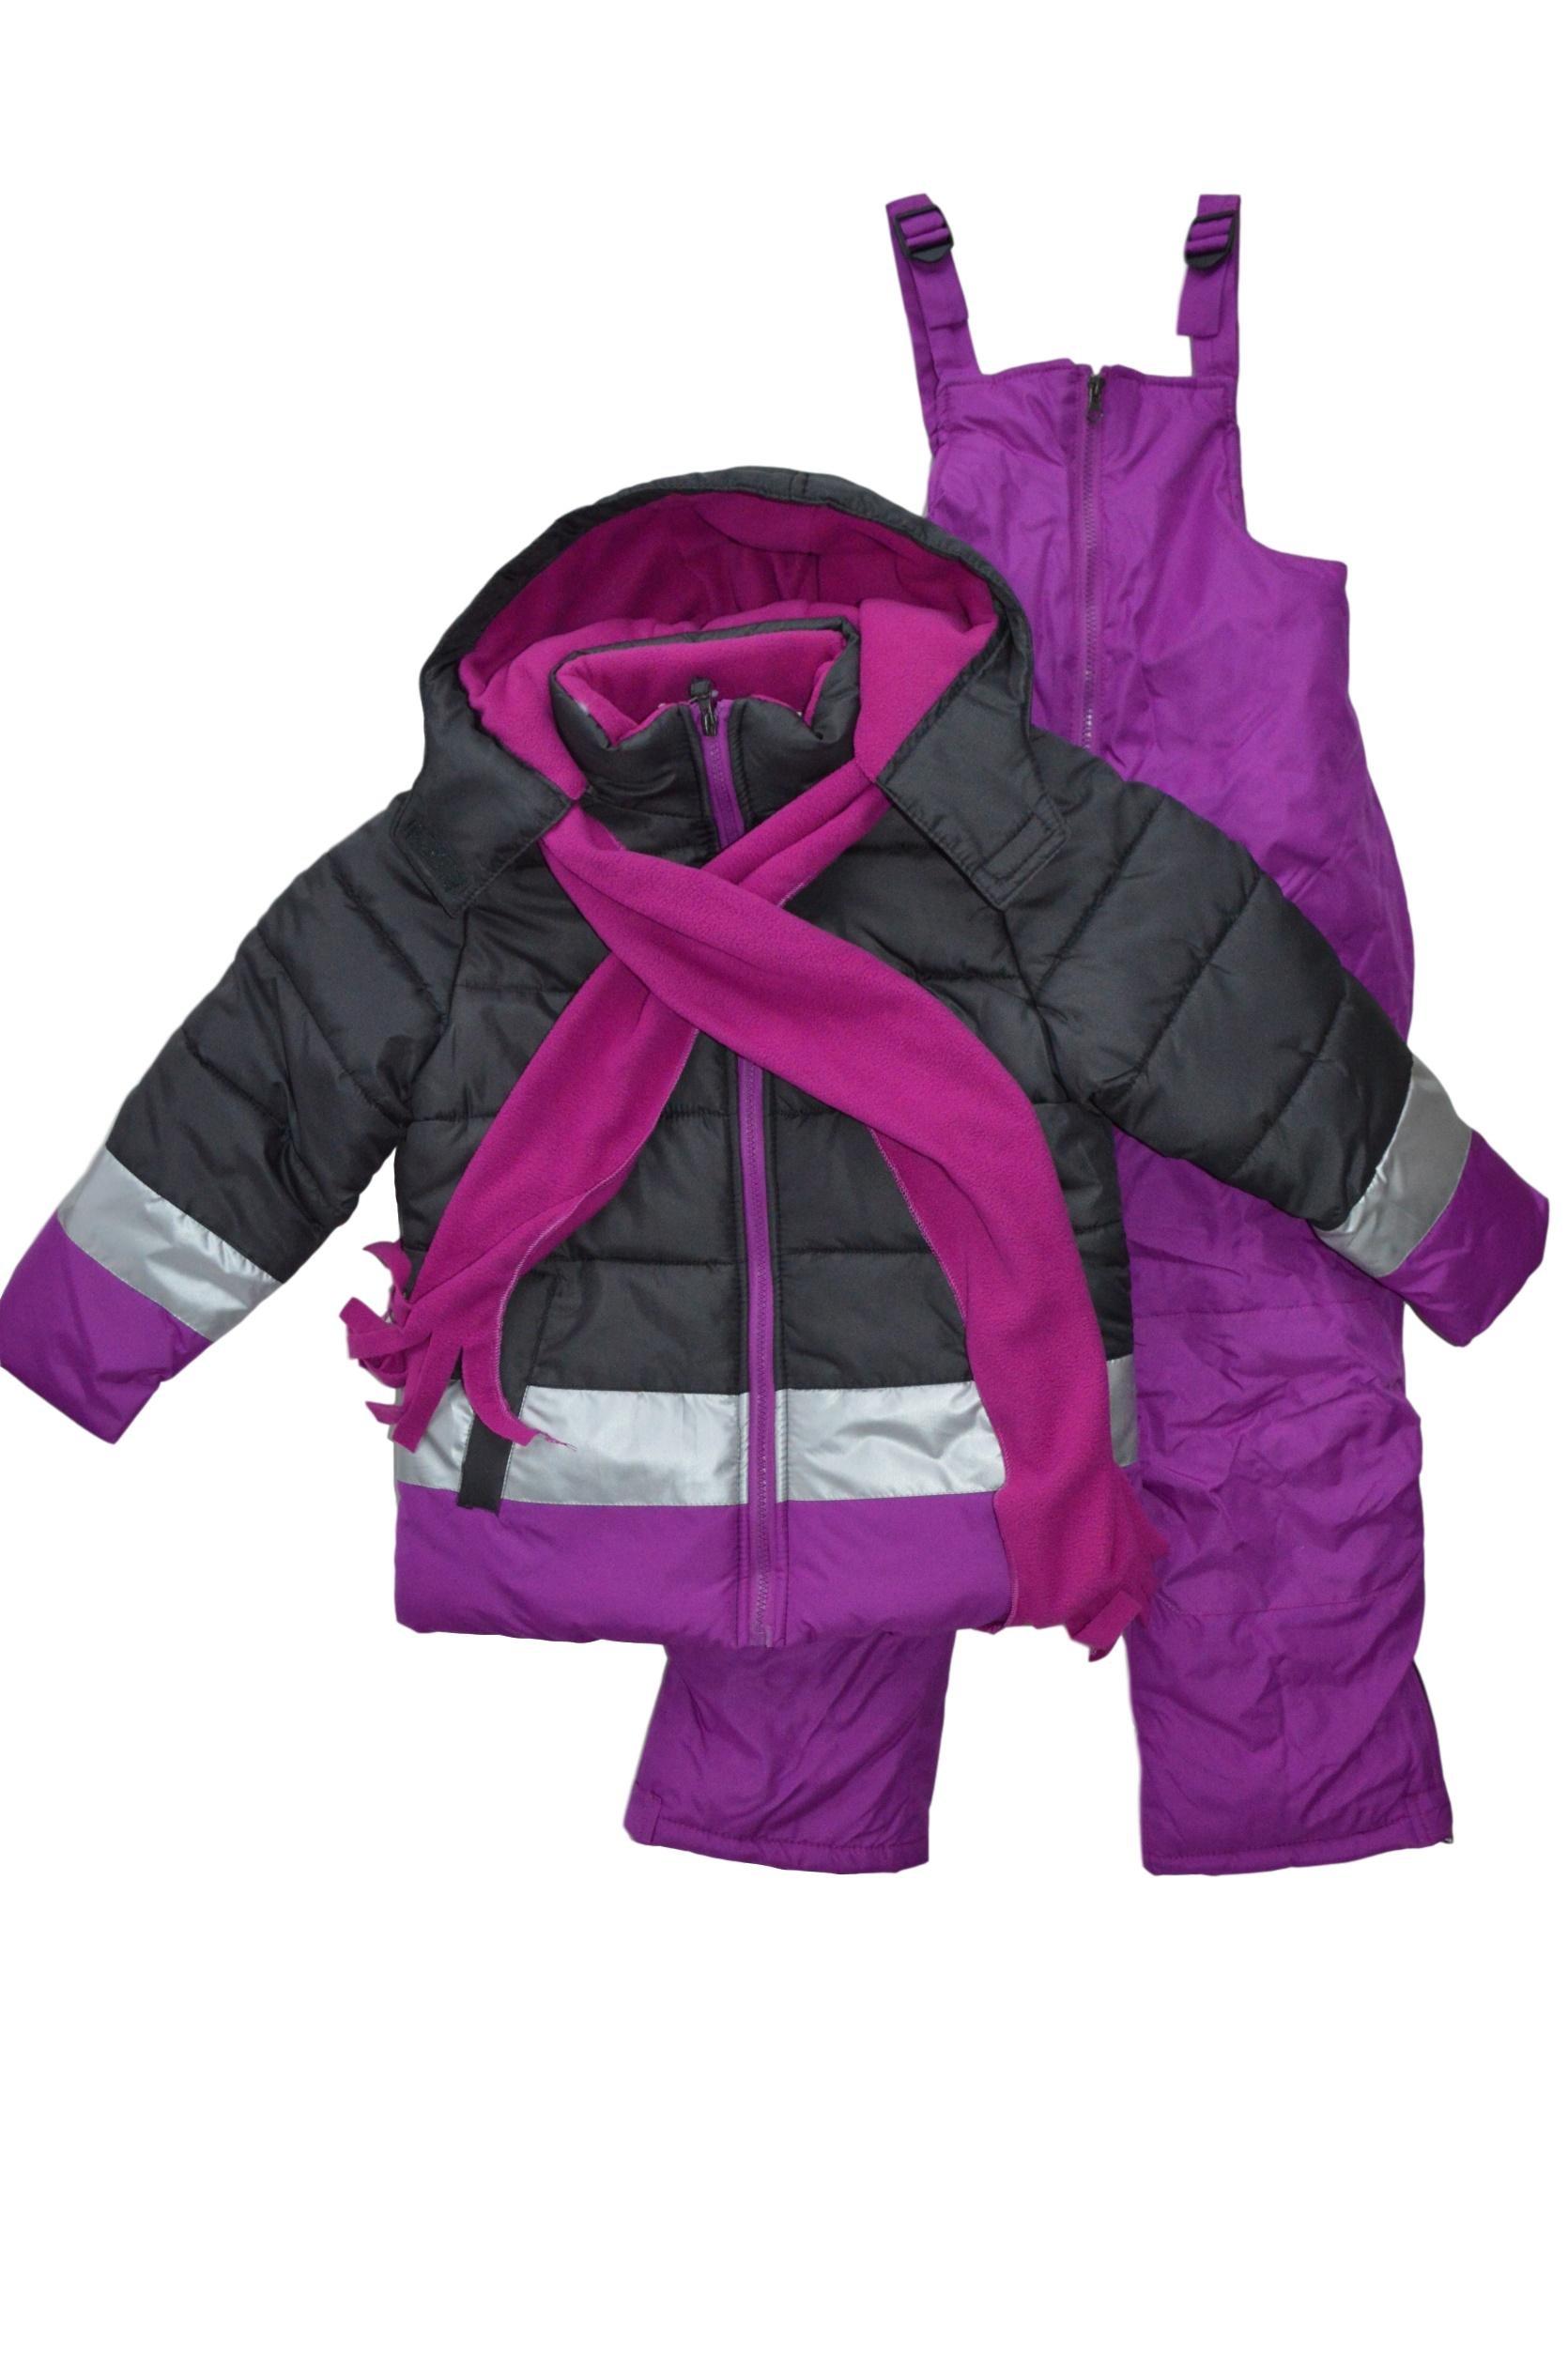 Snowsuits for Kids Girl's 3-Piece Fleece Lined Active Snowsuit (10-12, SGREY) by Snowsuits for Kids